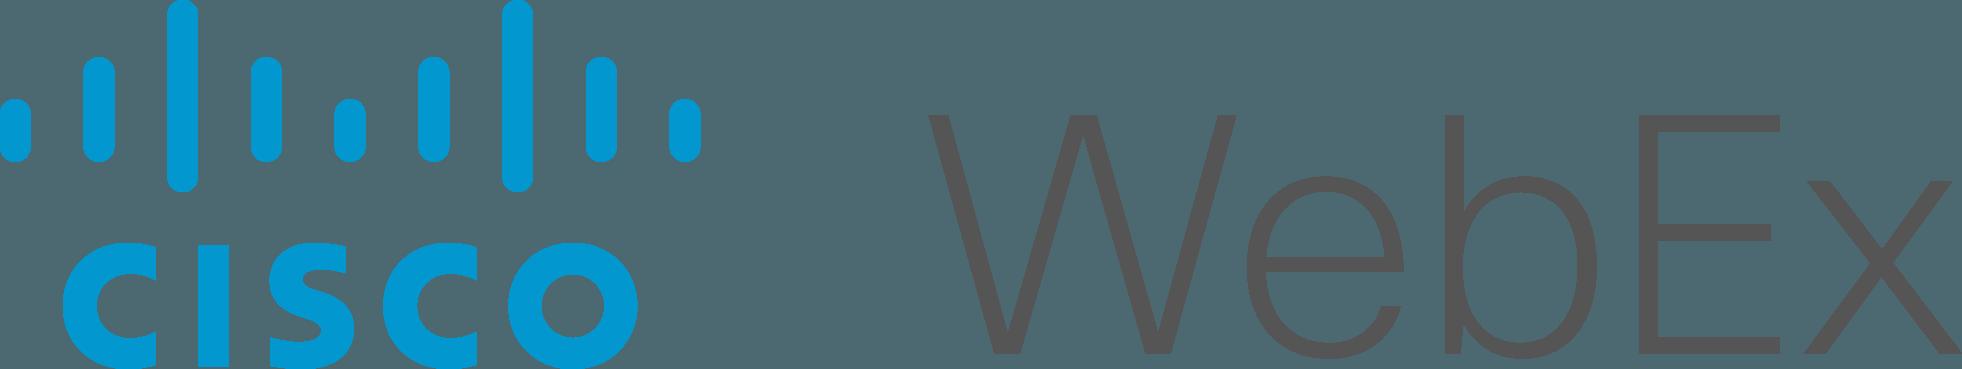 Cisco WebEx Logo - LogoDix